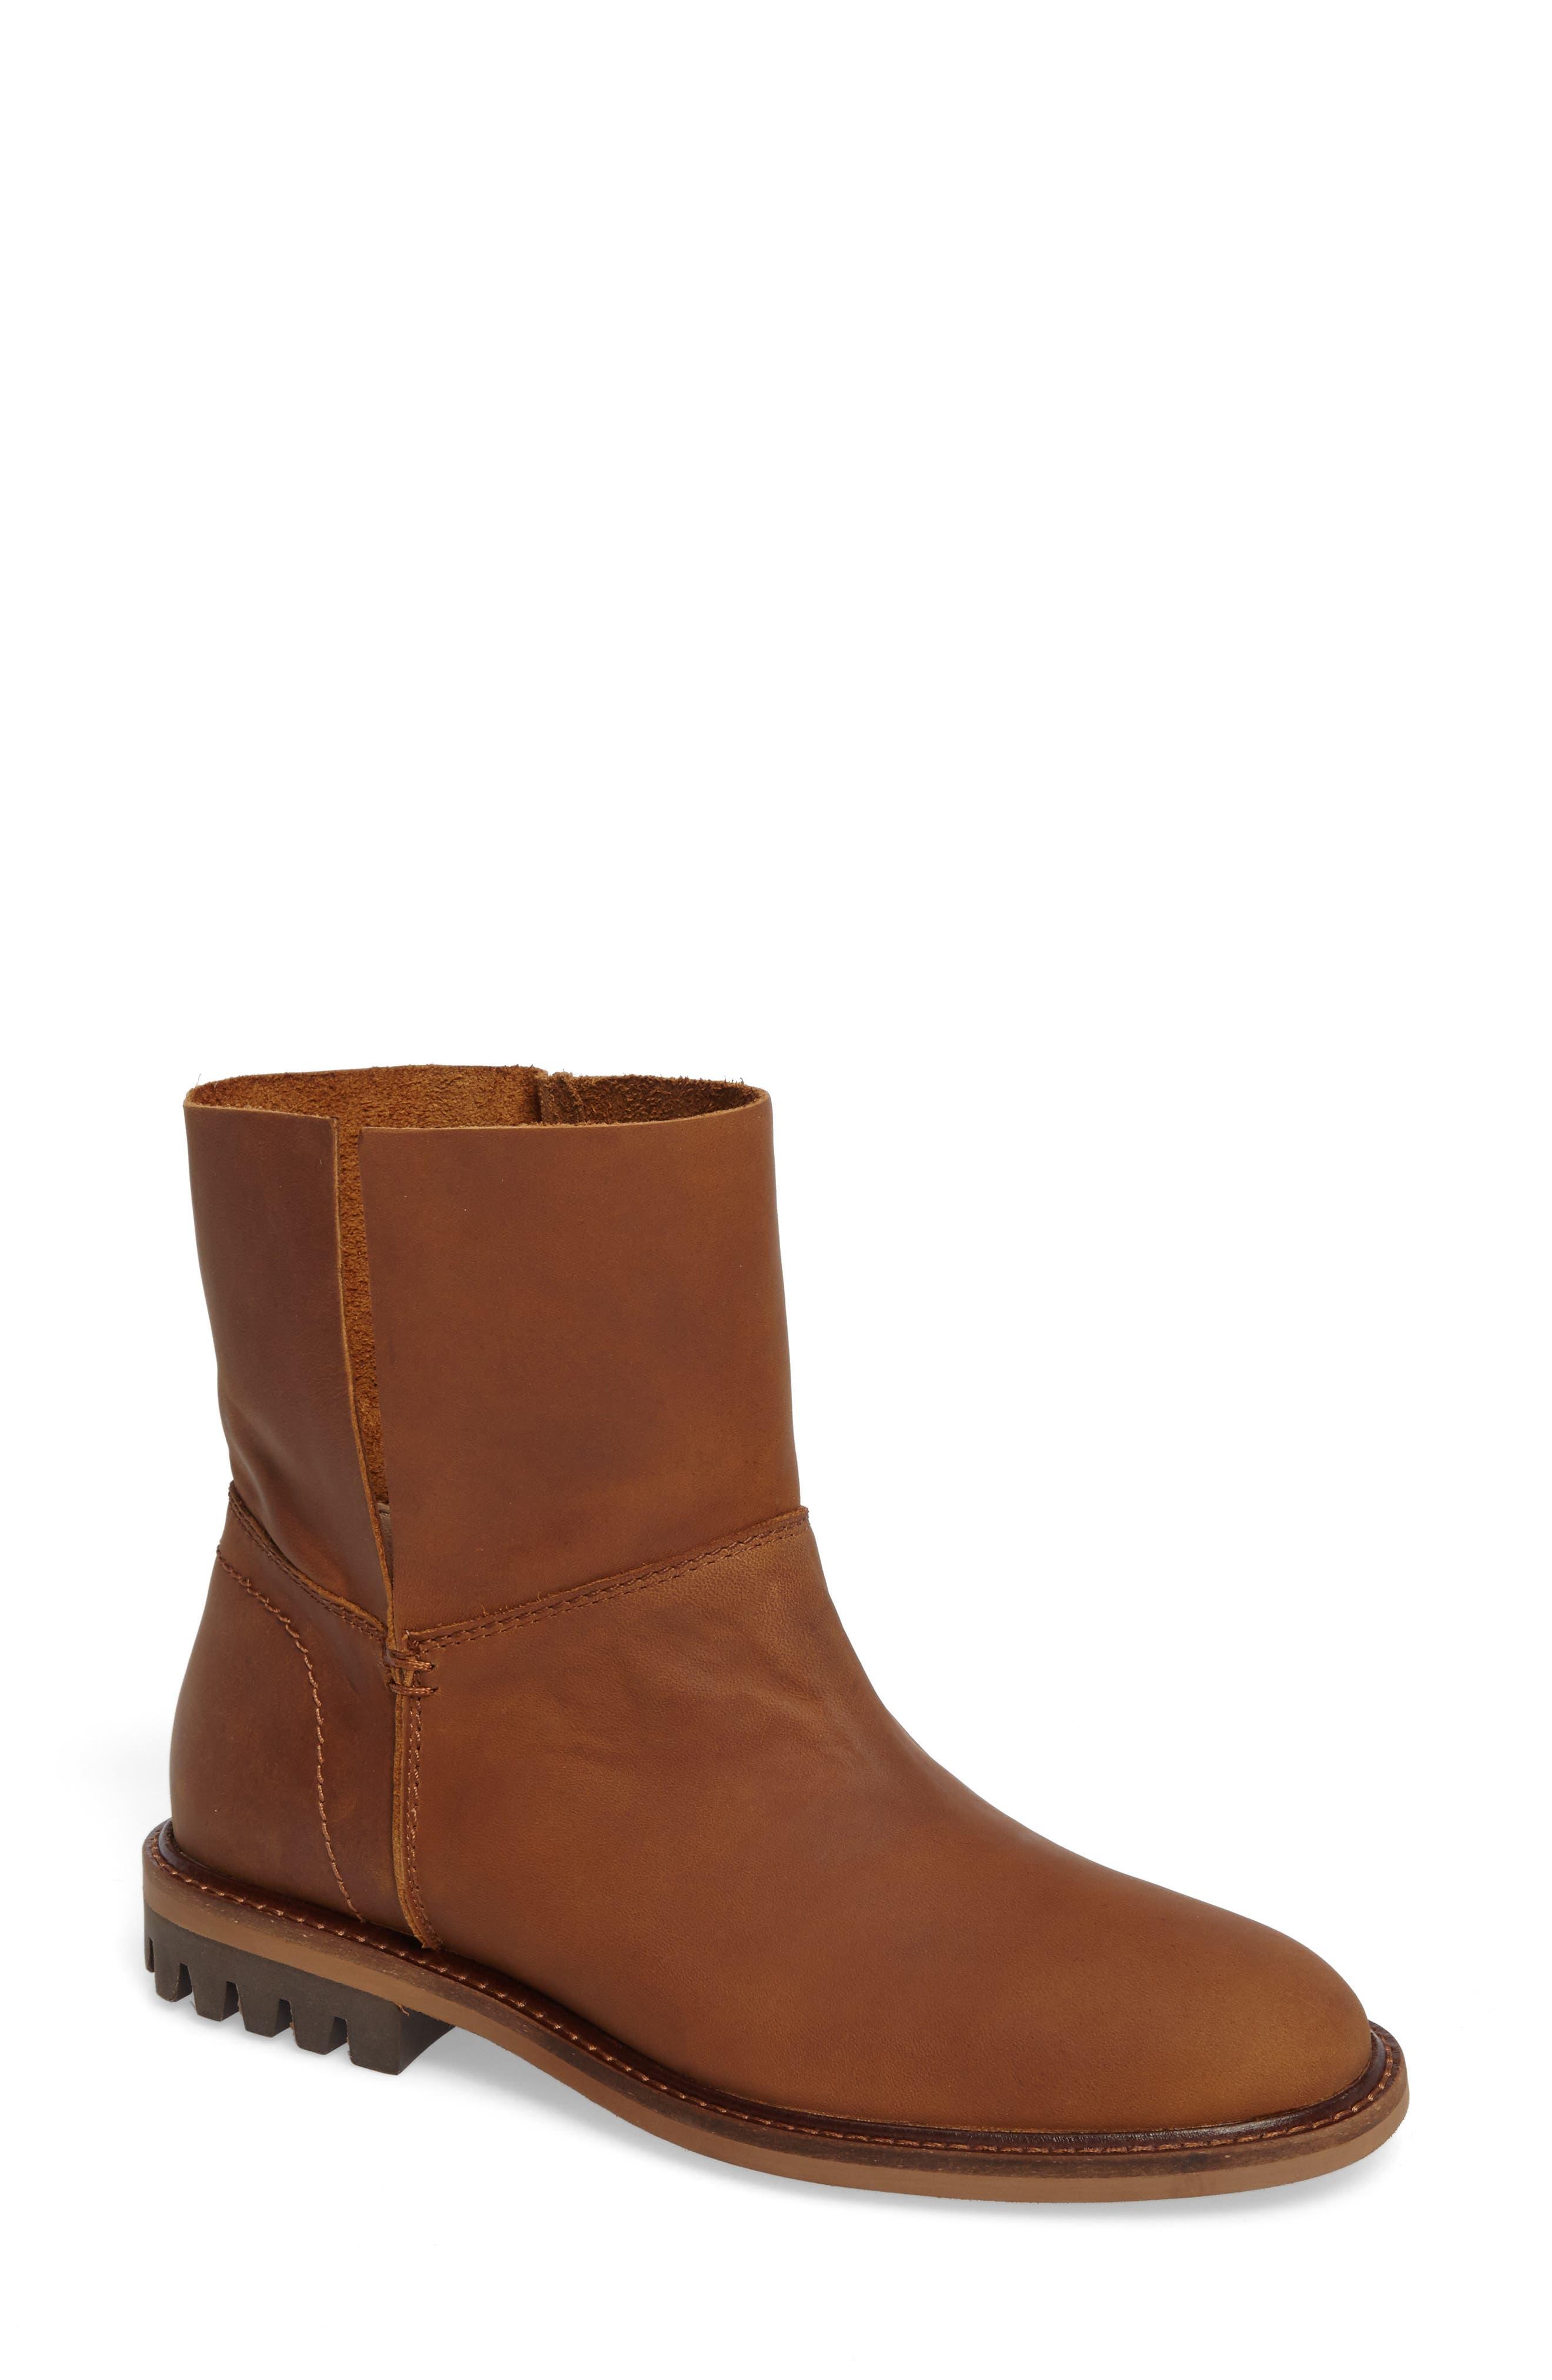 Borough Boot,                         Main,                         color, Chestnut